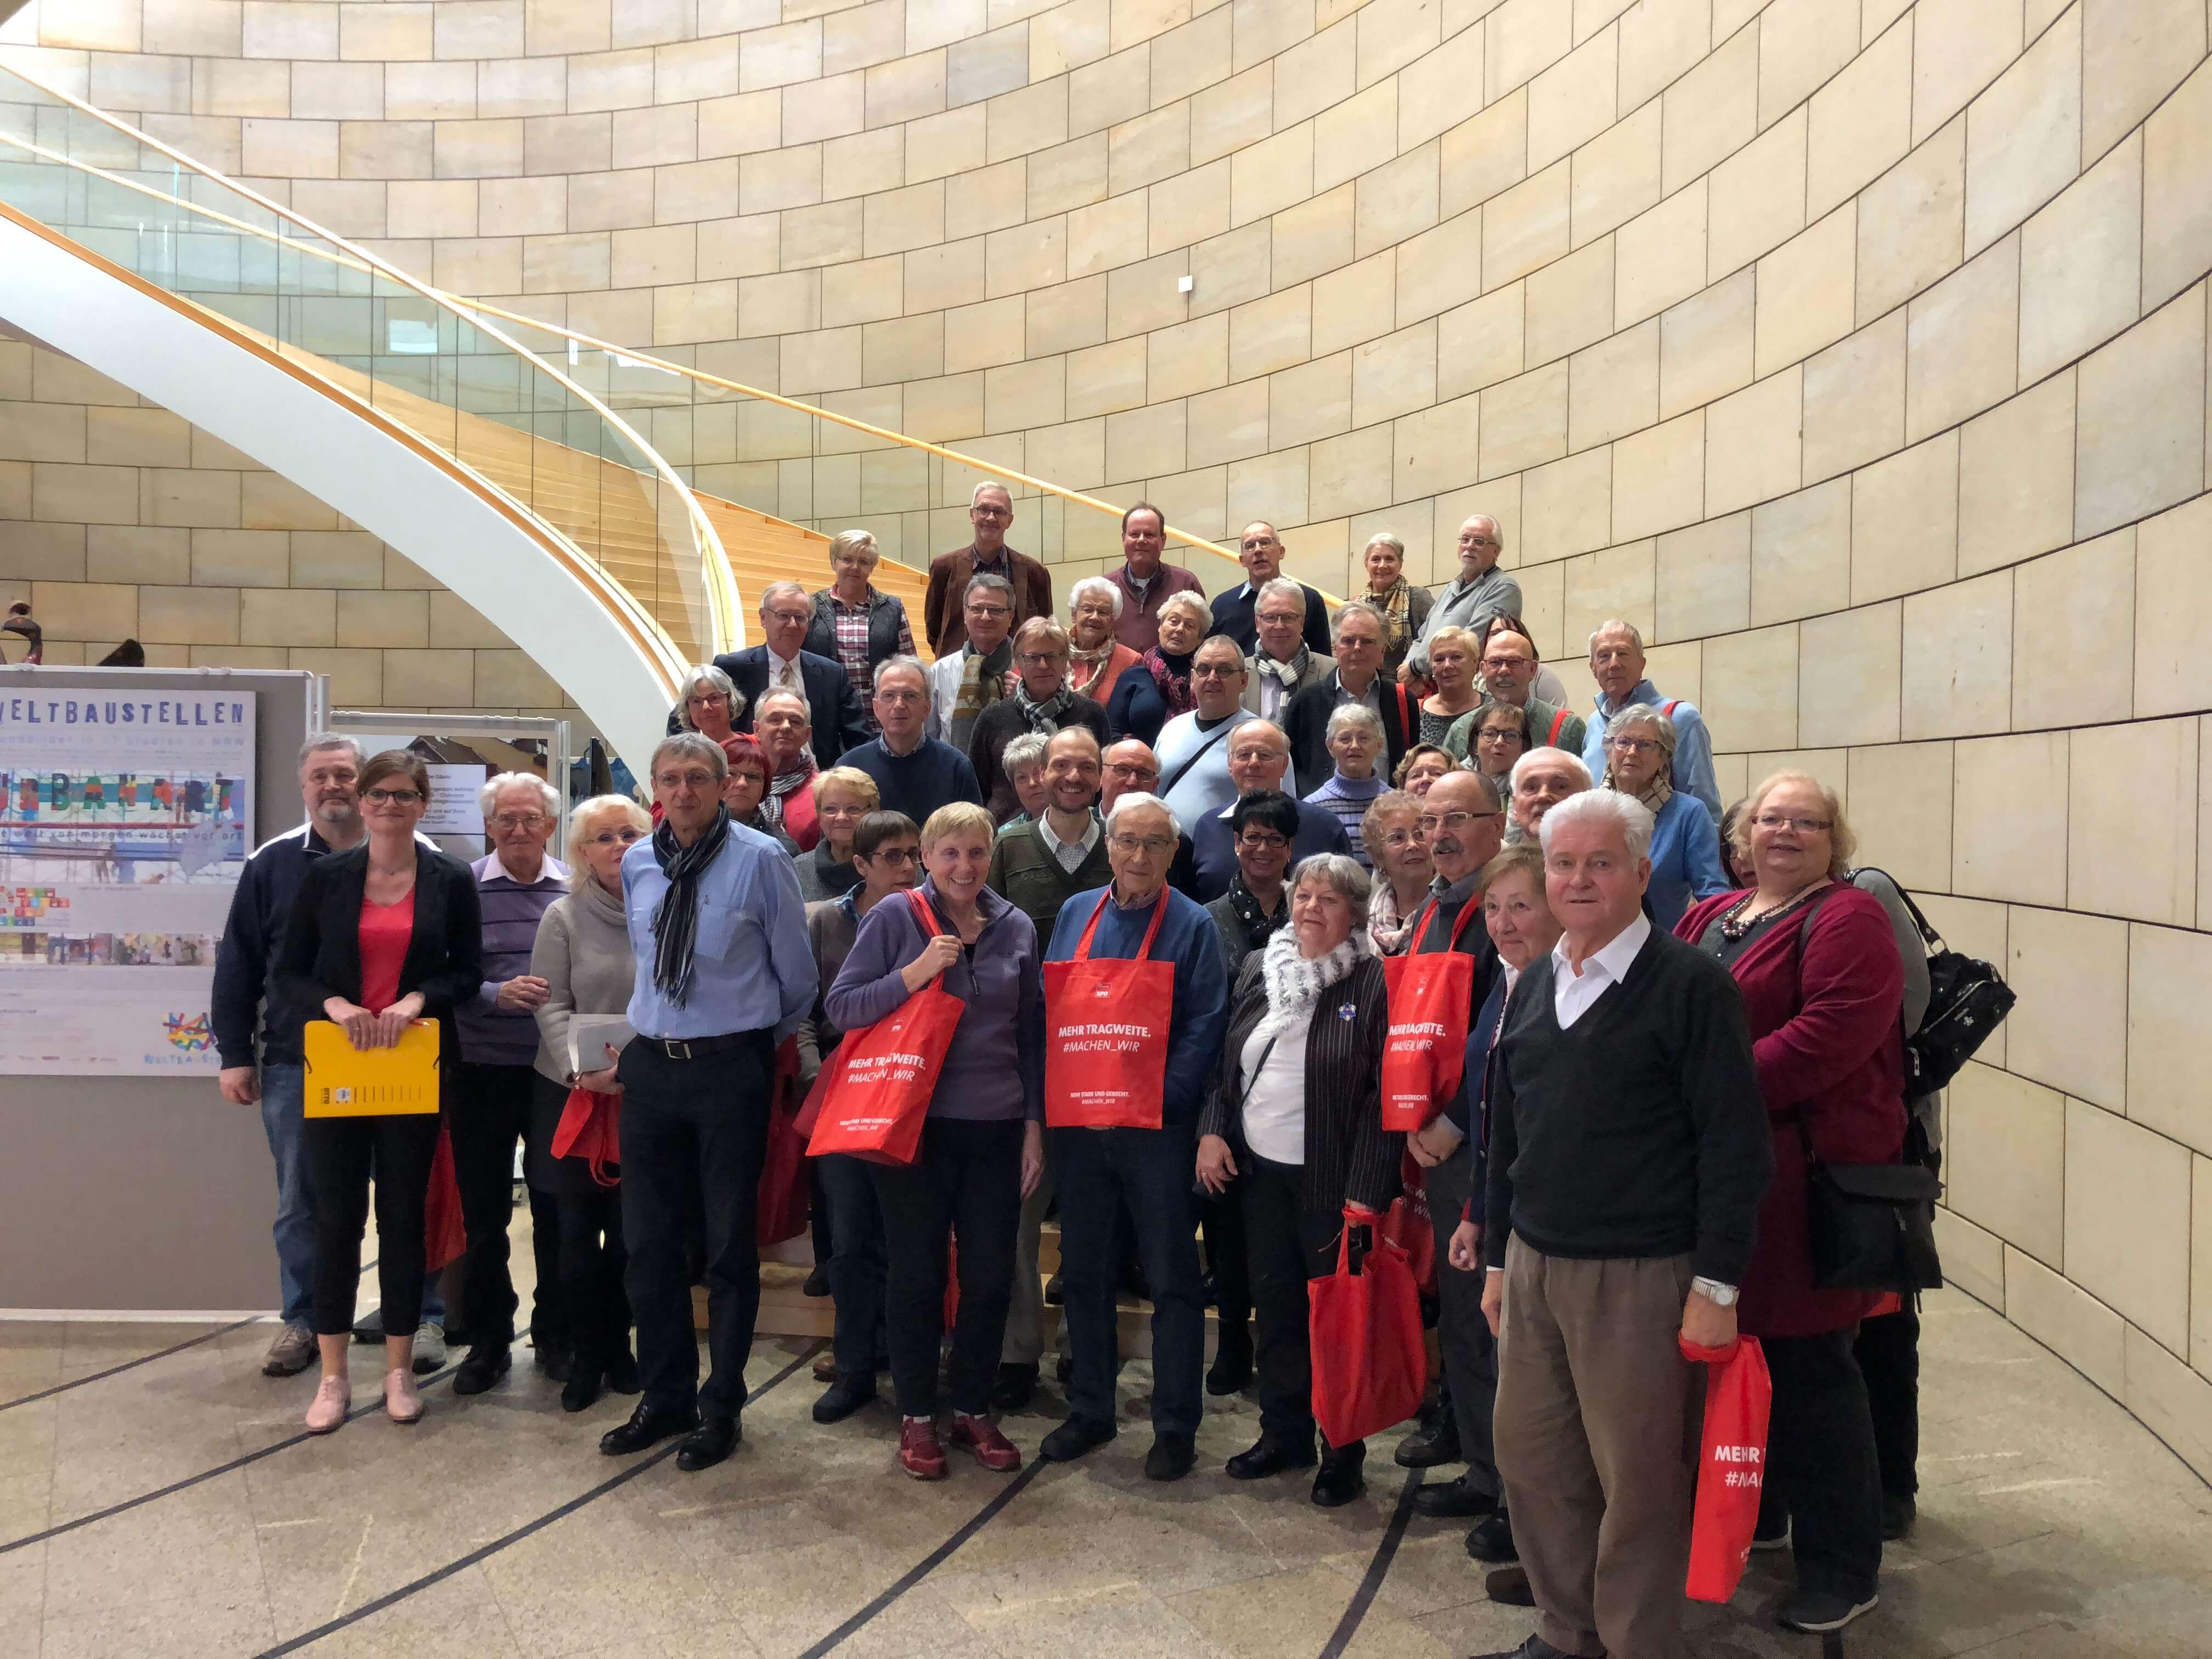 Sarah Philipp begrüßt Bürgerinnen und Bürger aus Duisburg im Landtag